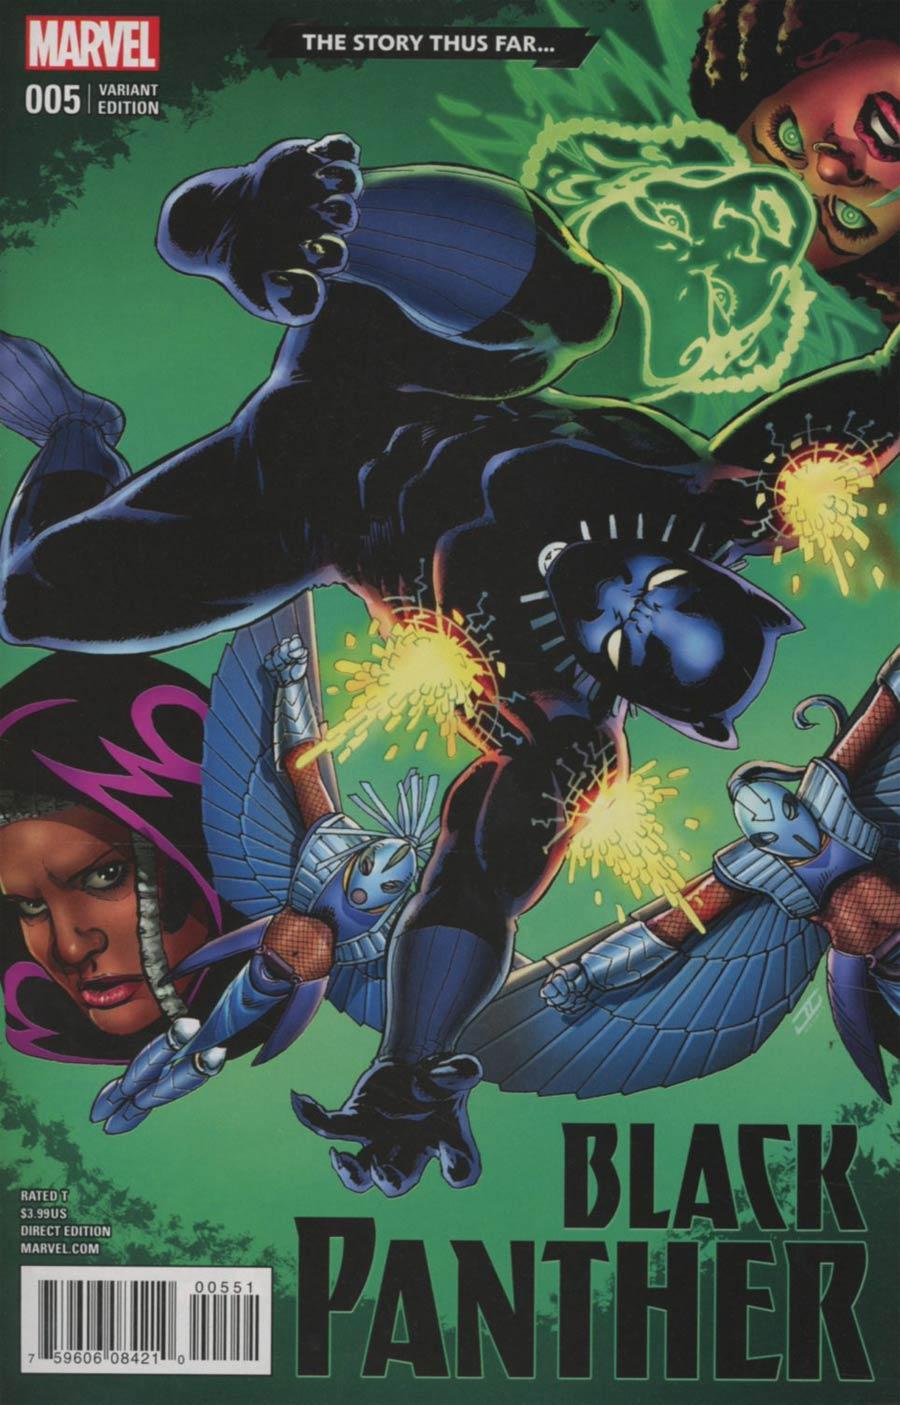 Black Panther Vol 6 #5 Cover E Variant John Cassaday Story Thus Far Cover